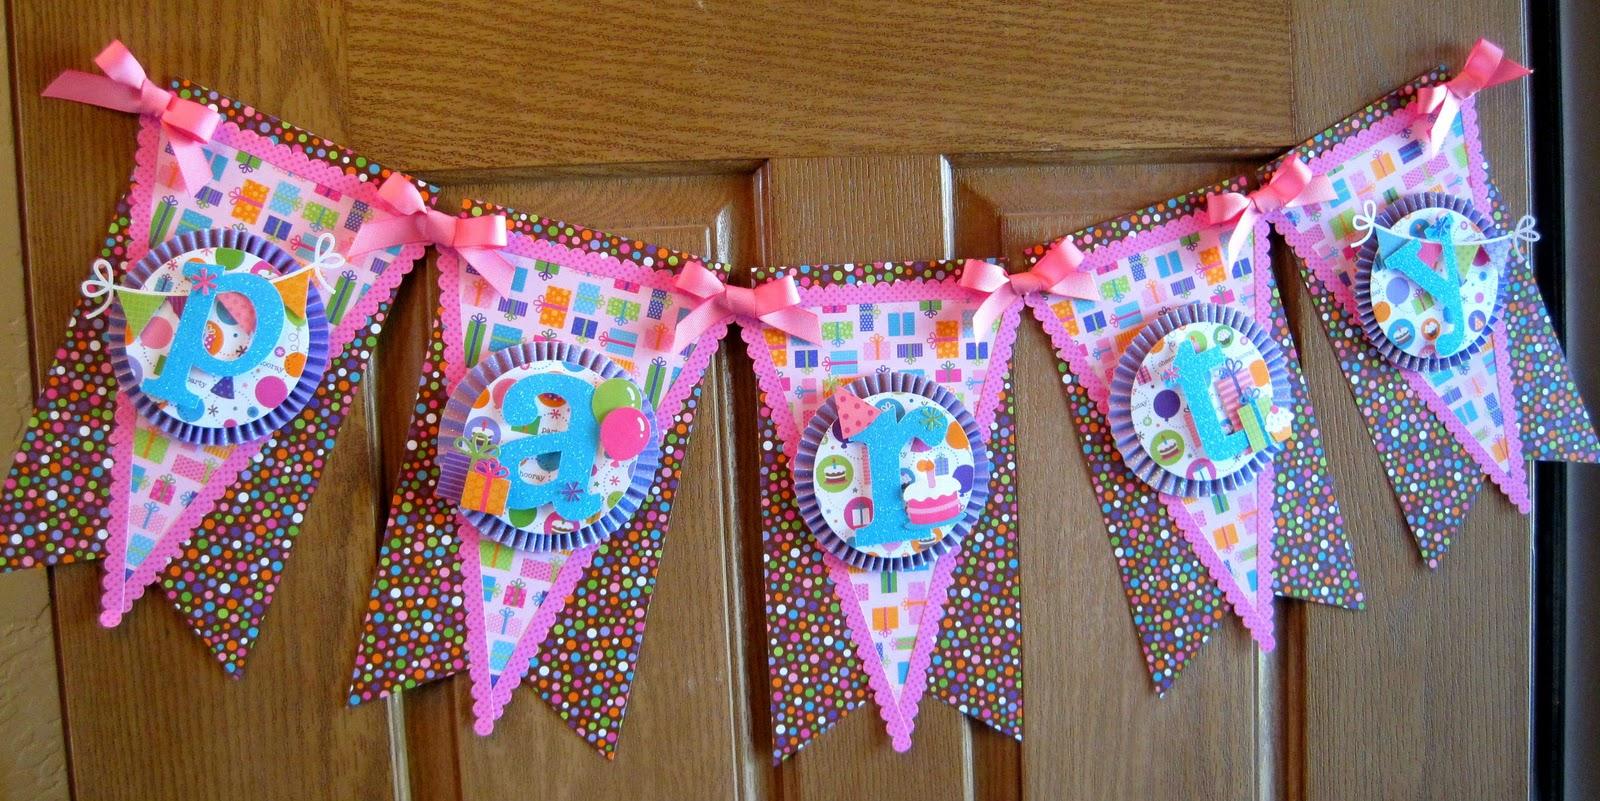 Doodlebug Design Inc Blog: Party Banner by Tiffany Hood